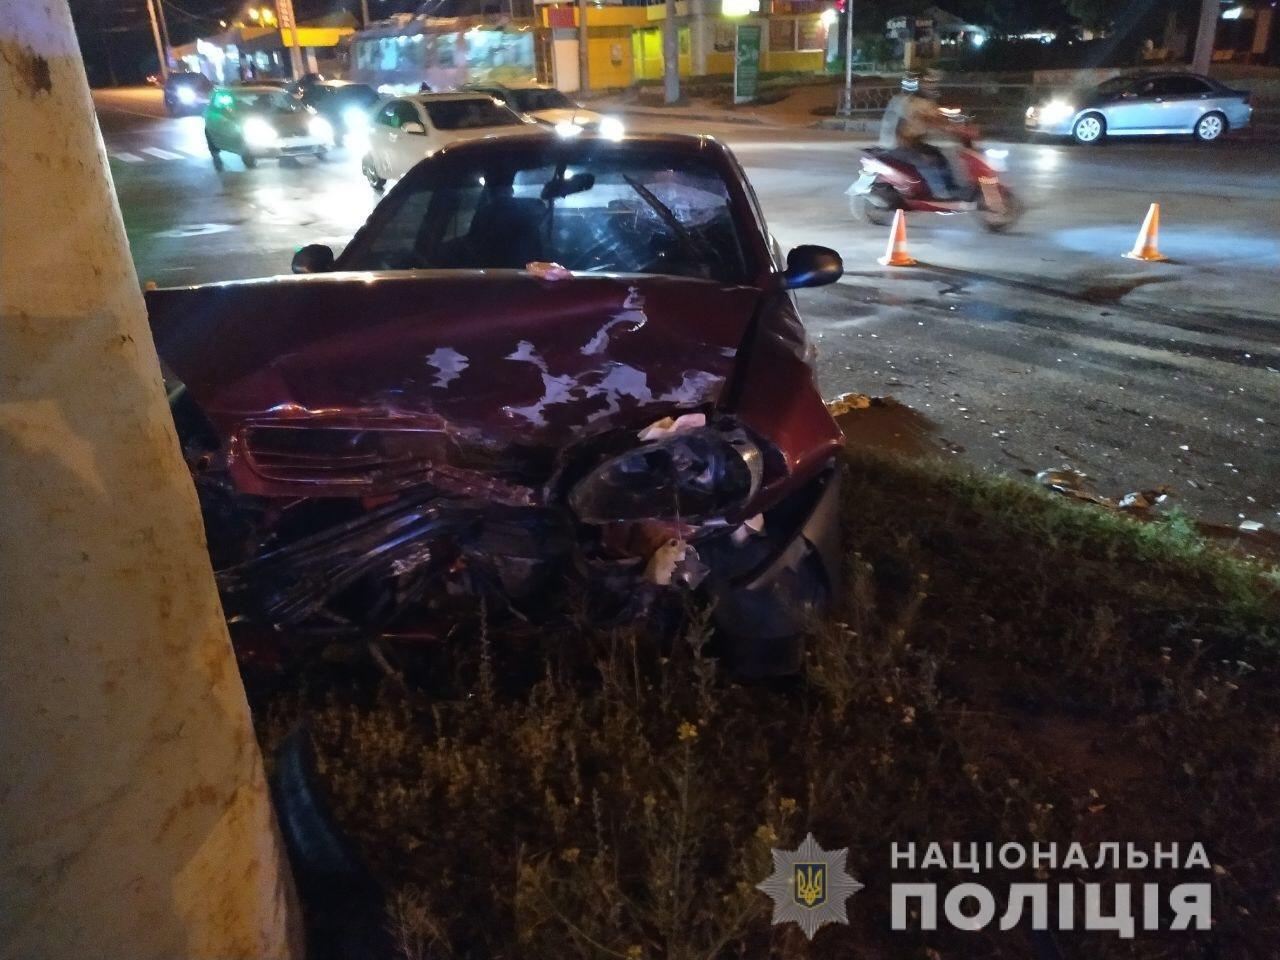 ДТП на Салтовке с пострадавшими: полиция устанавливает причины аварии, - ФОТО, фото-1